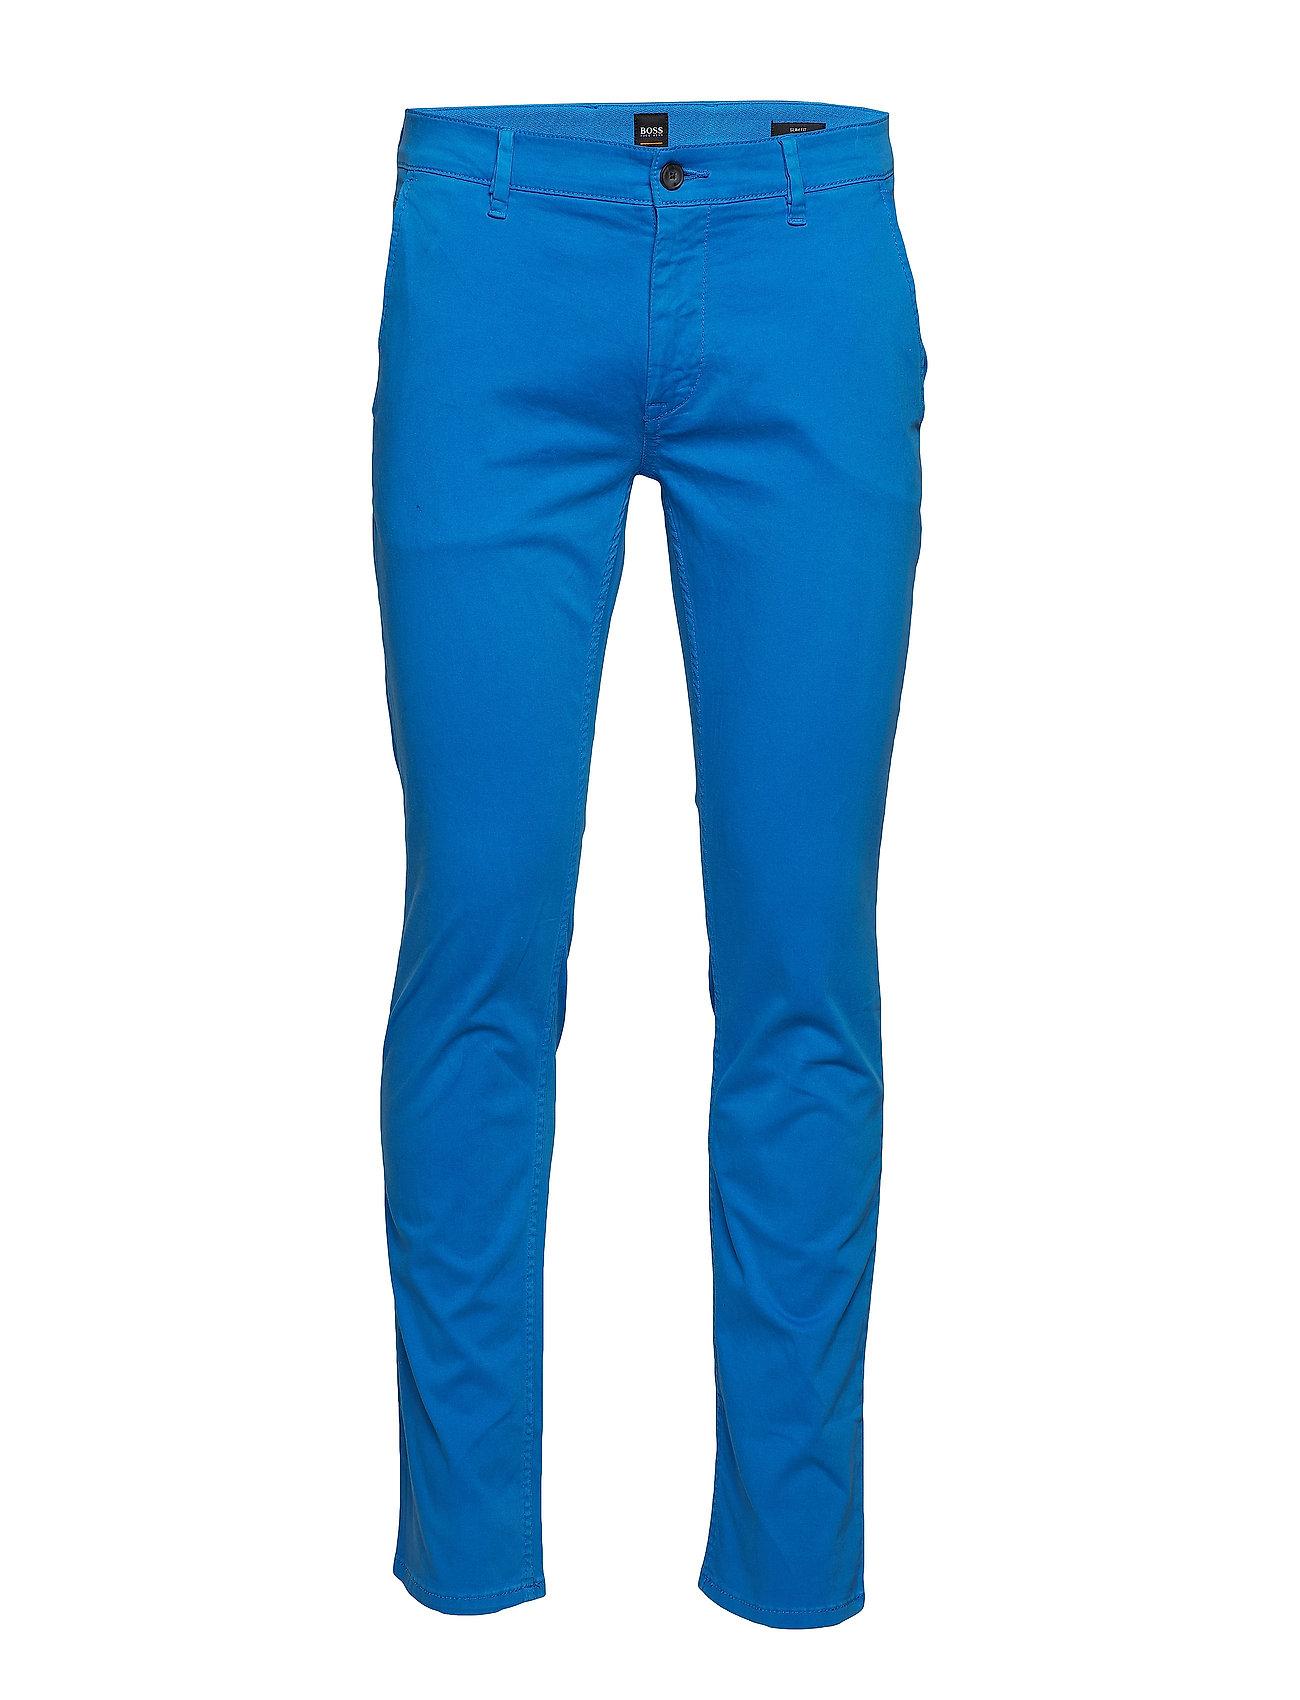 HUGO BOSS Schino-Slim D Chinos Hosen Blau BOSS CASUAL WEAR